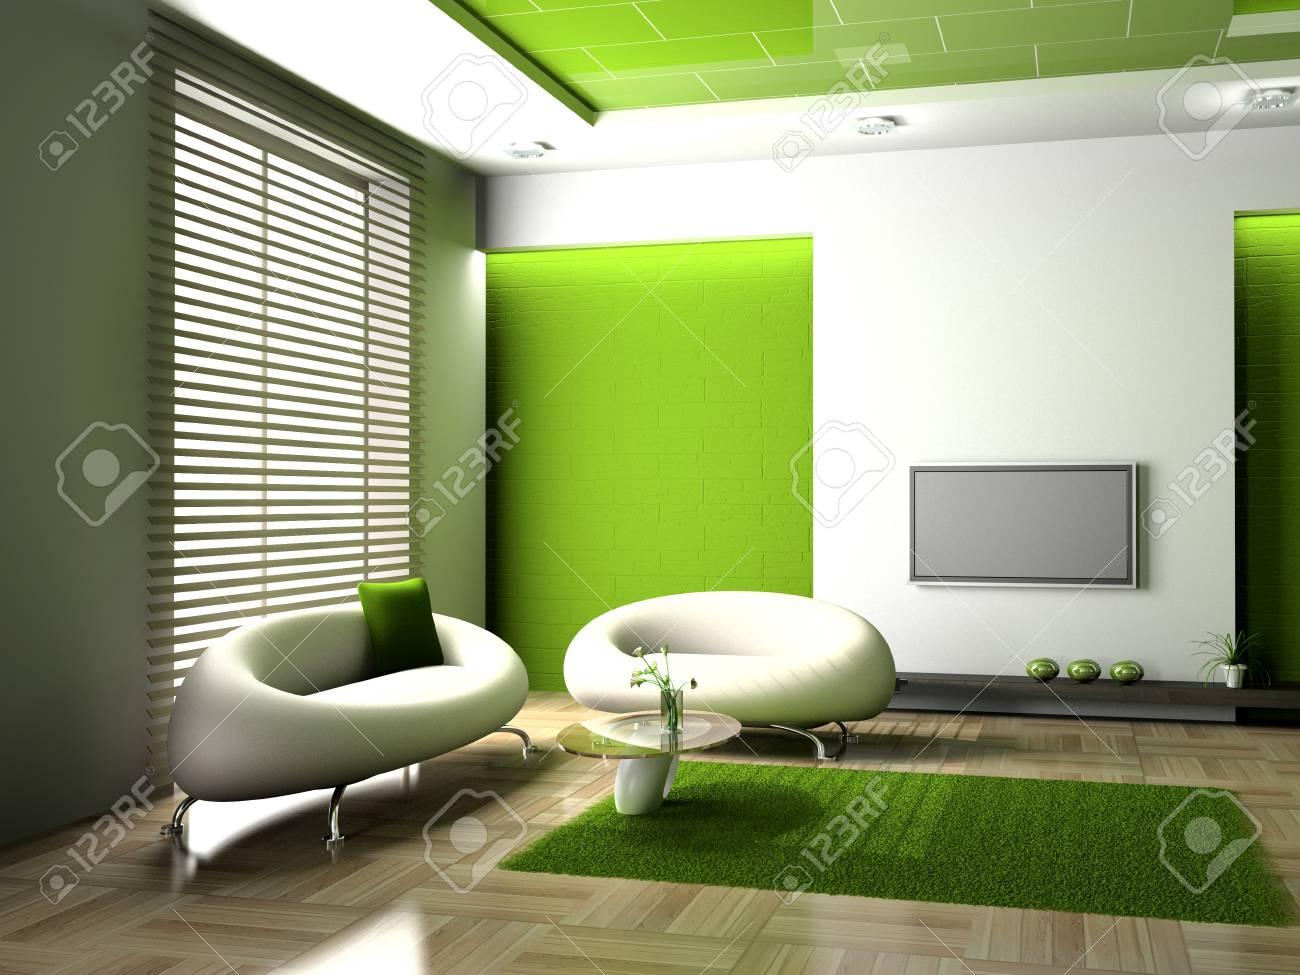 modern interior of living room 3D Stock Photo - 7349331